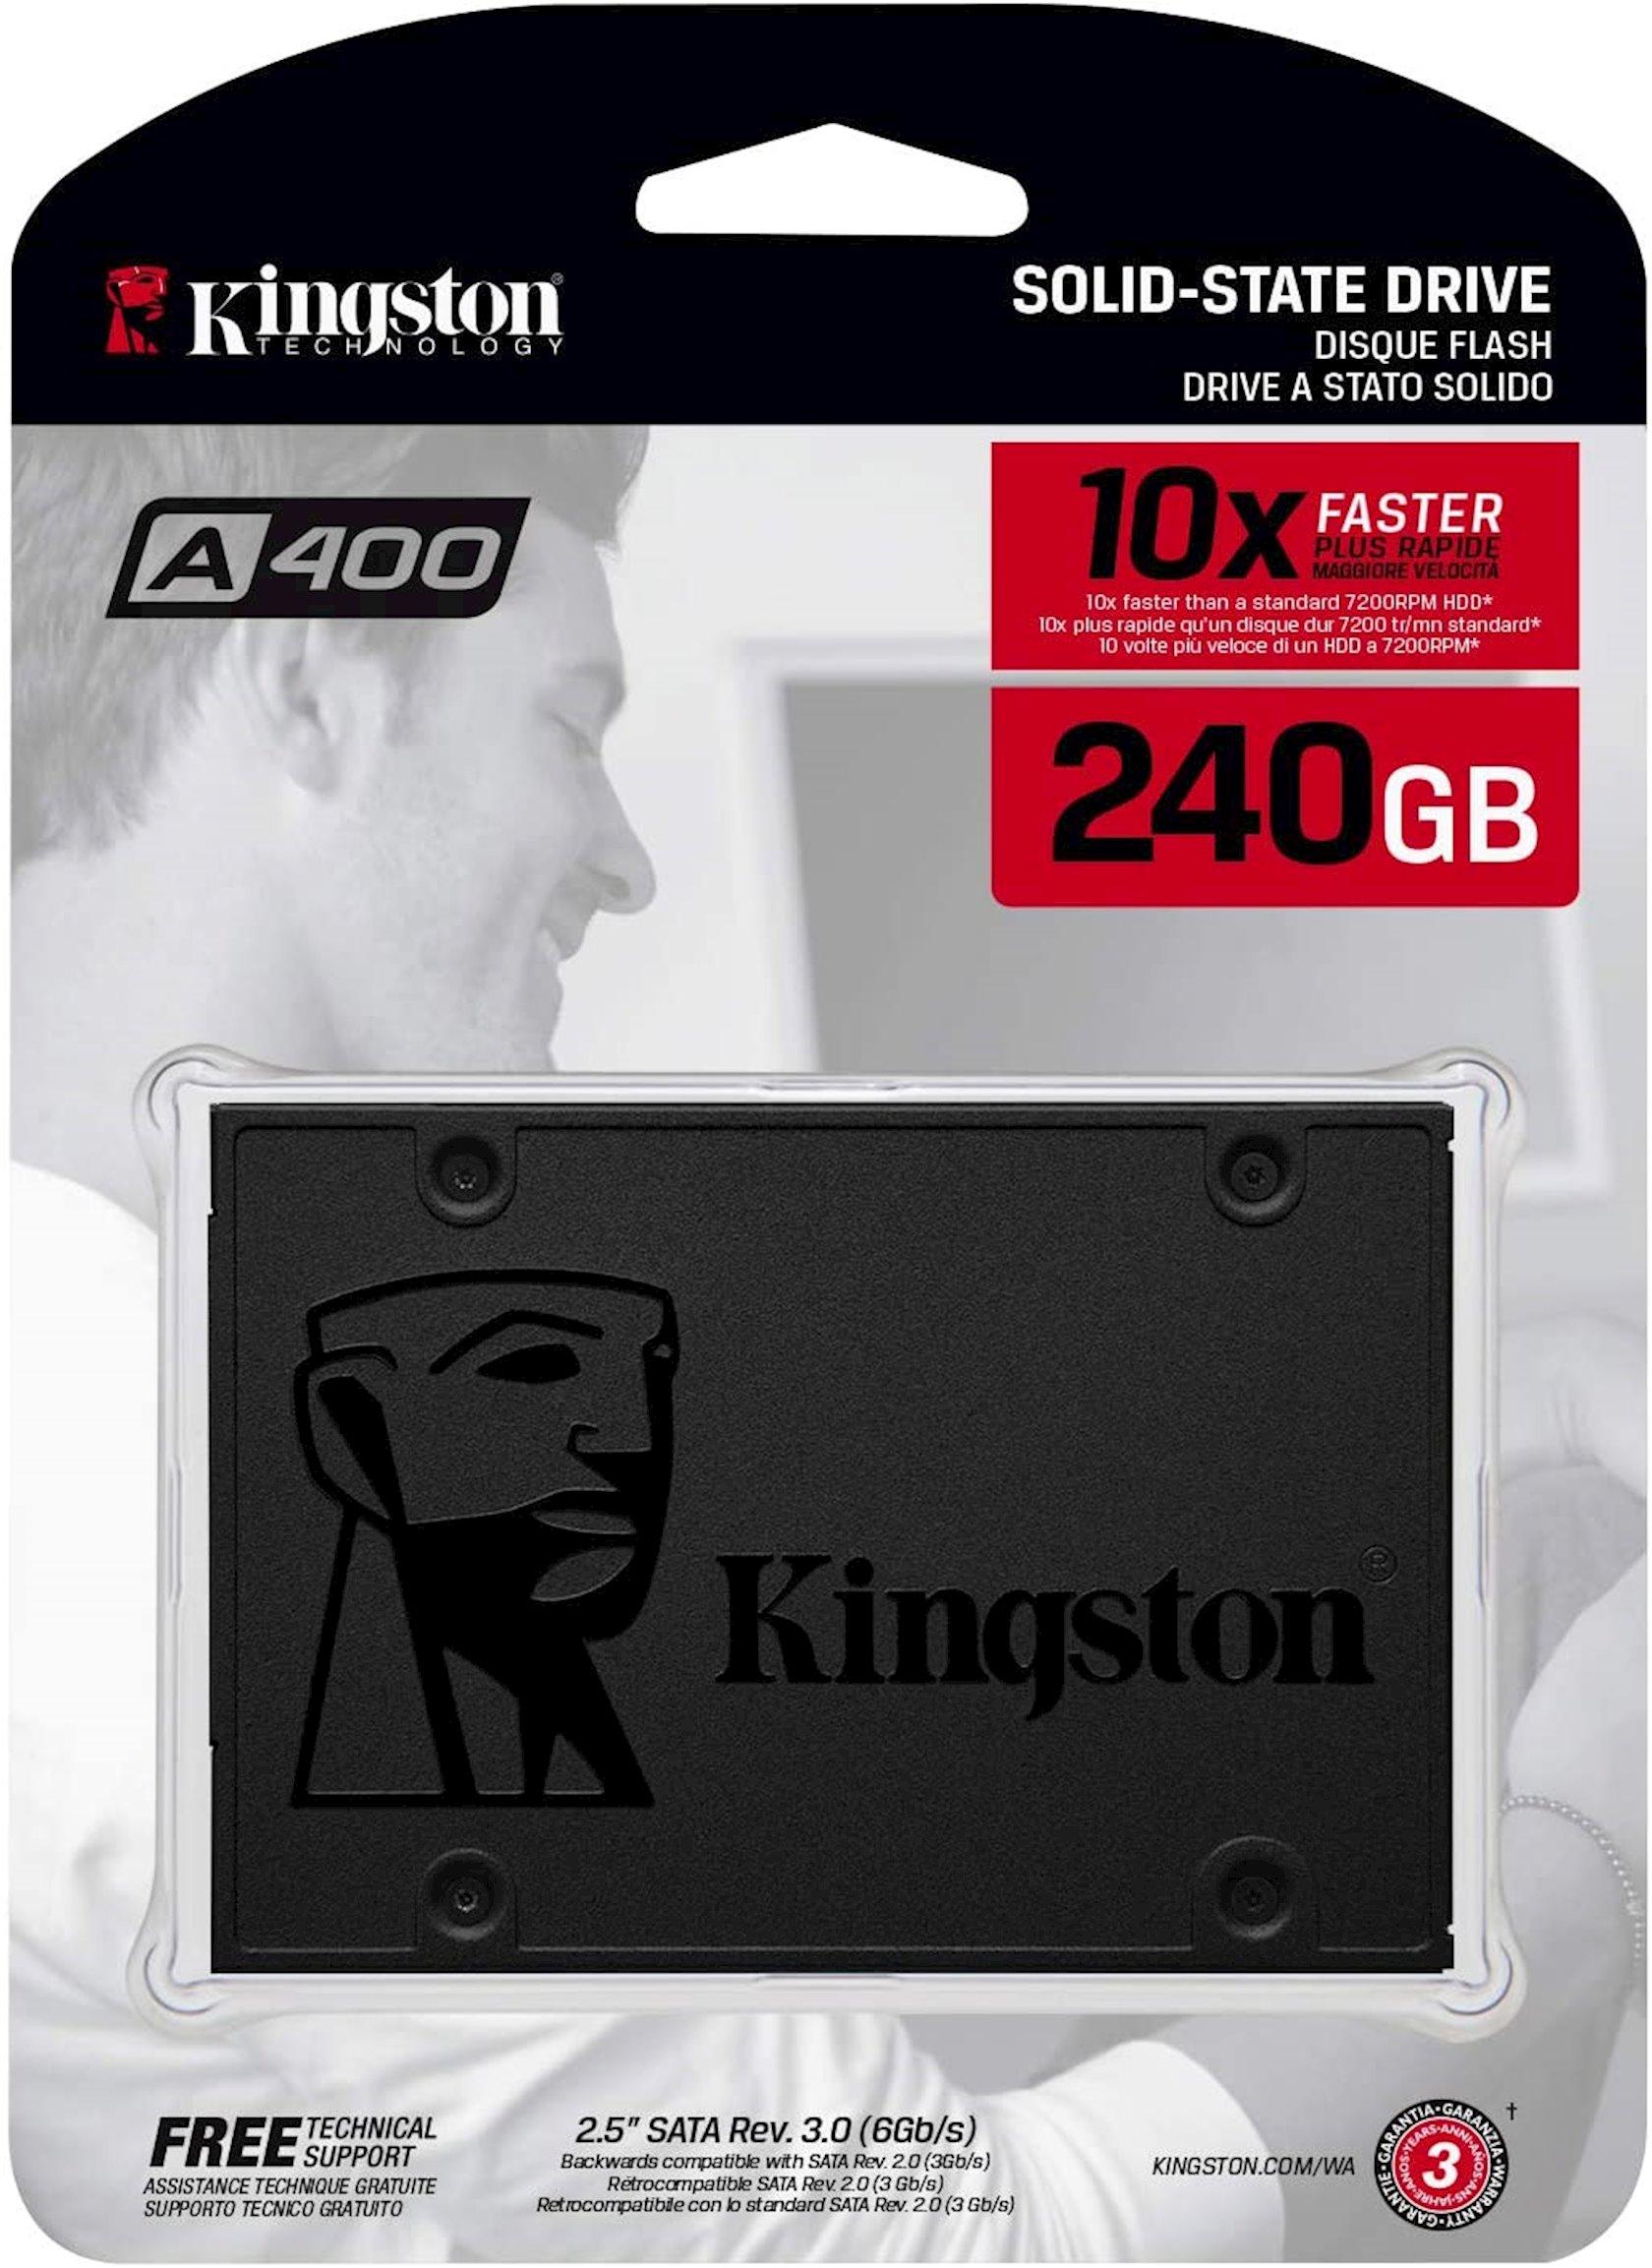 Disk SSD Kingston 240GB A400 SATA3 2.5 SSD (7mm height)